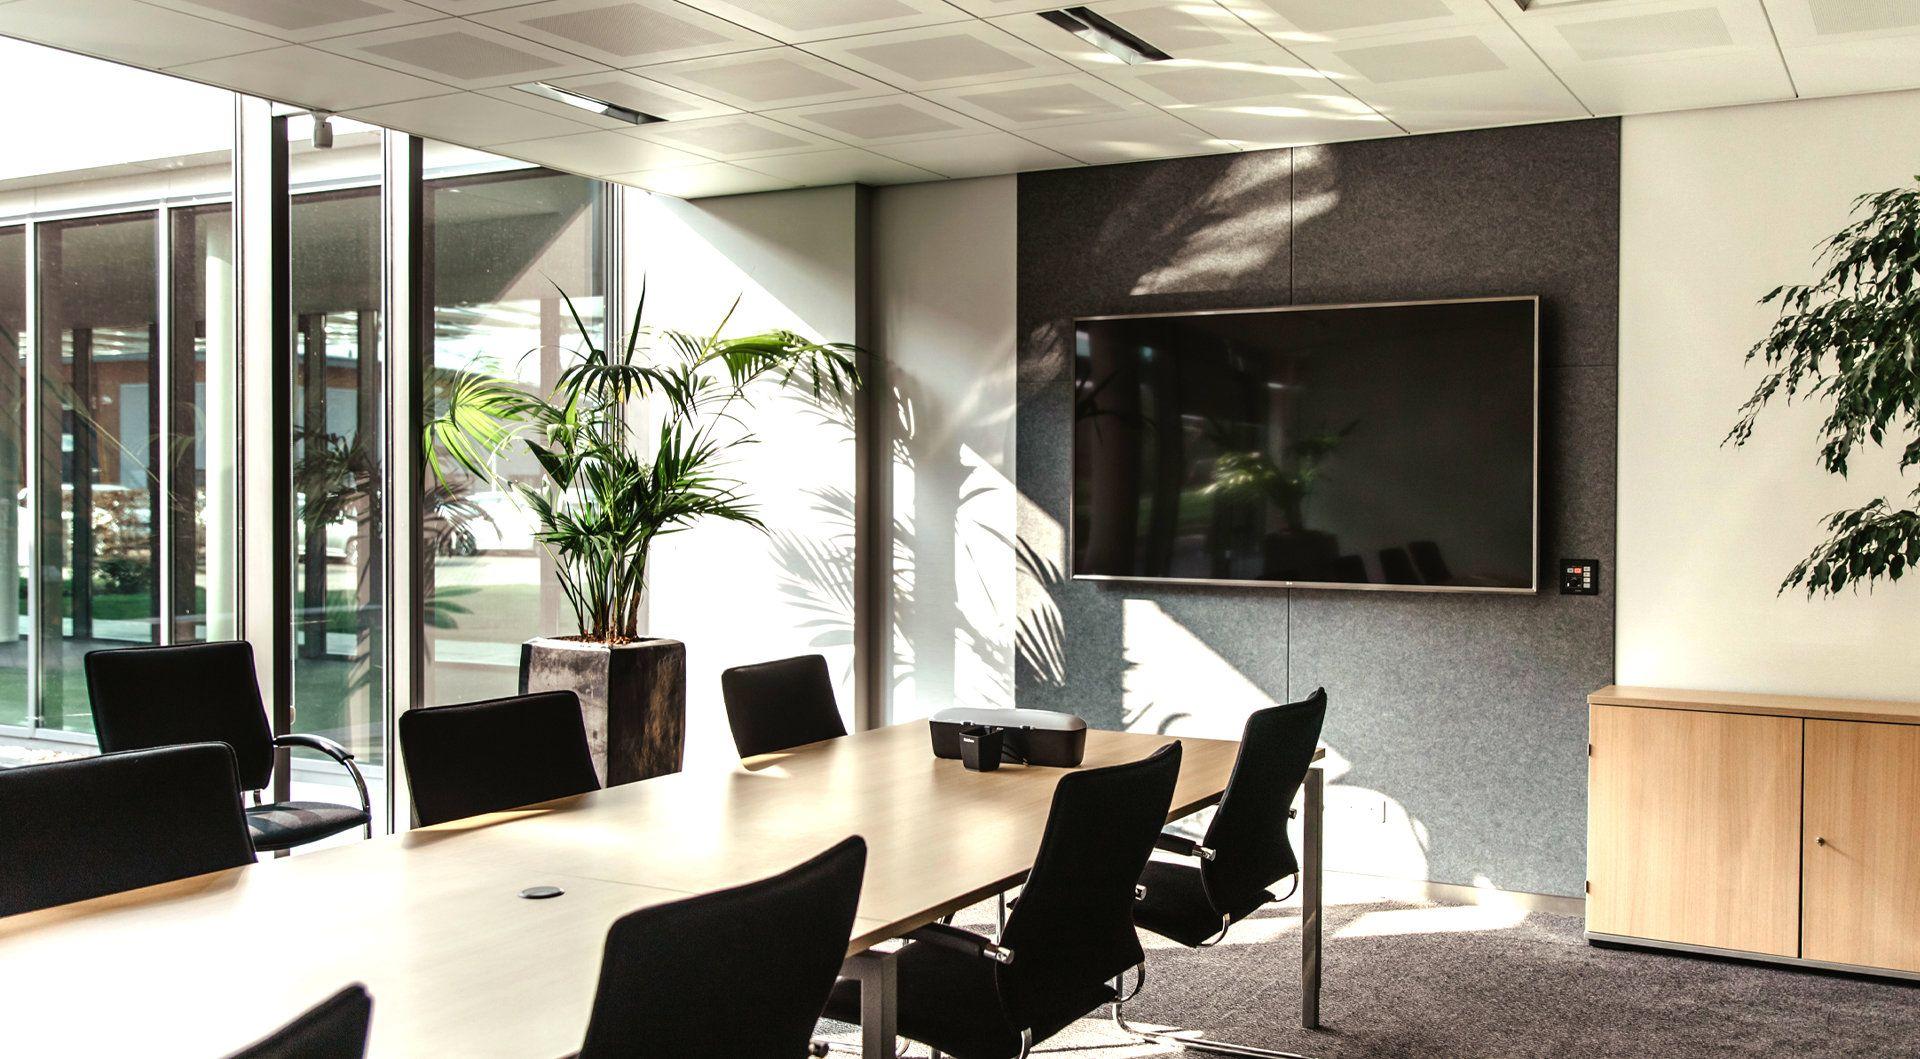 "Projecta HomeScreen 118x196 Matte White P projectiescherm 2,06 m (81"") 16:9 - Case studie de vries"